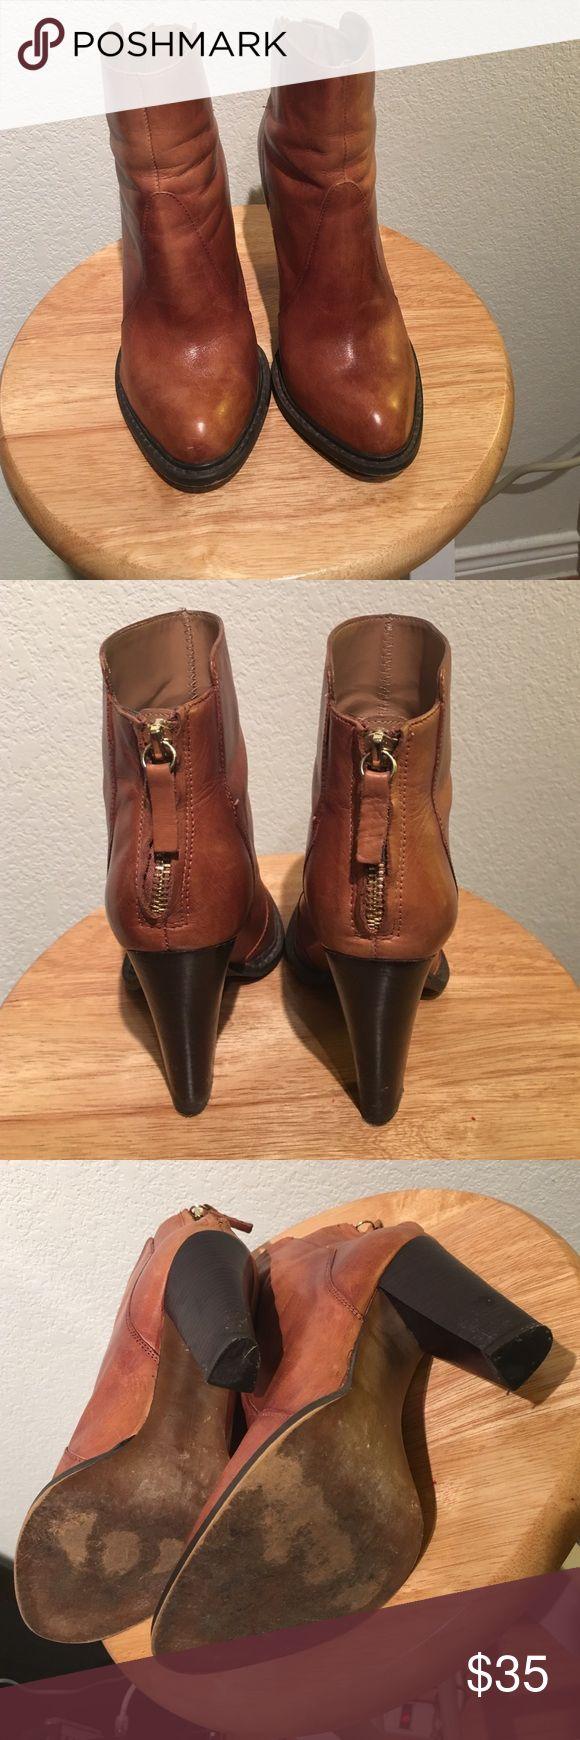 Zara Leather High Heel Ankle Boots* Zara Leather High Heel Ankle Boots* Zara Shoes Ankle Boots & Booties